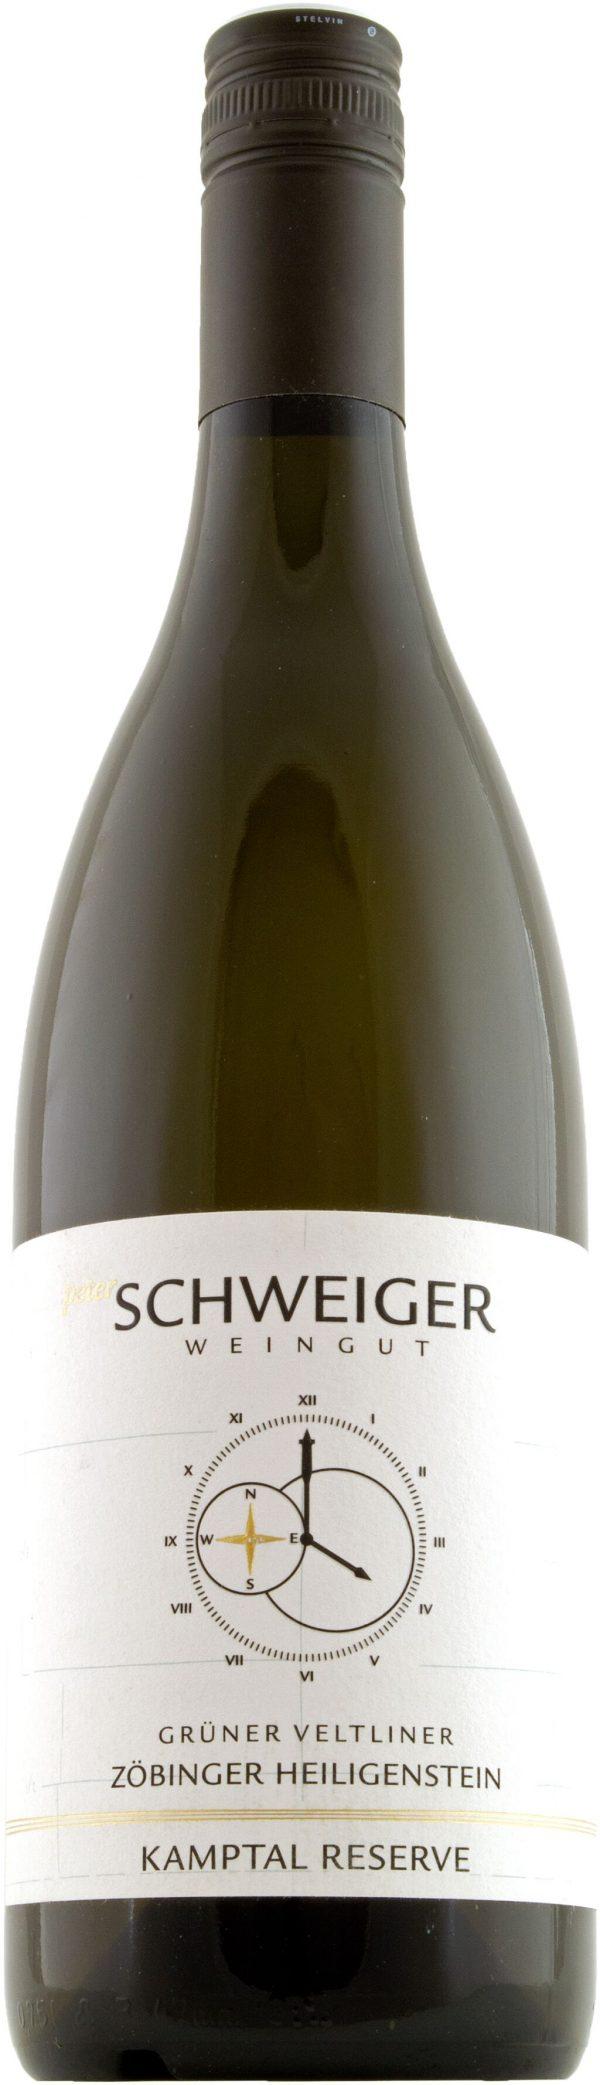 Zöbinger Heiligenstein Grüner Veltliner 75cl